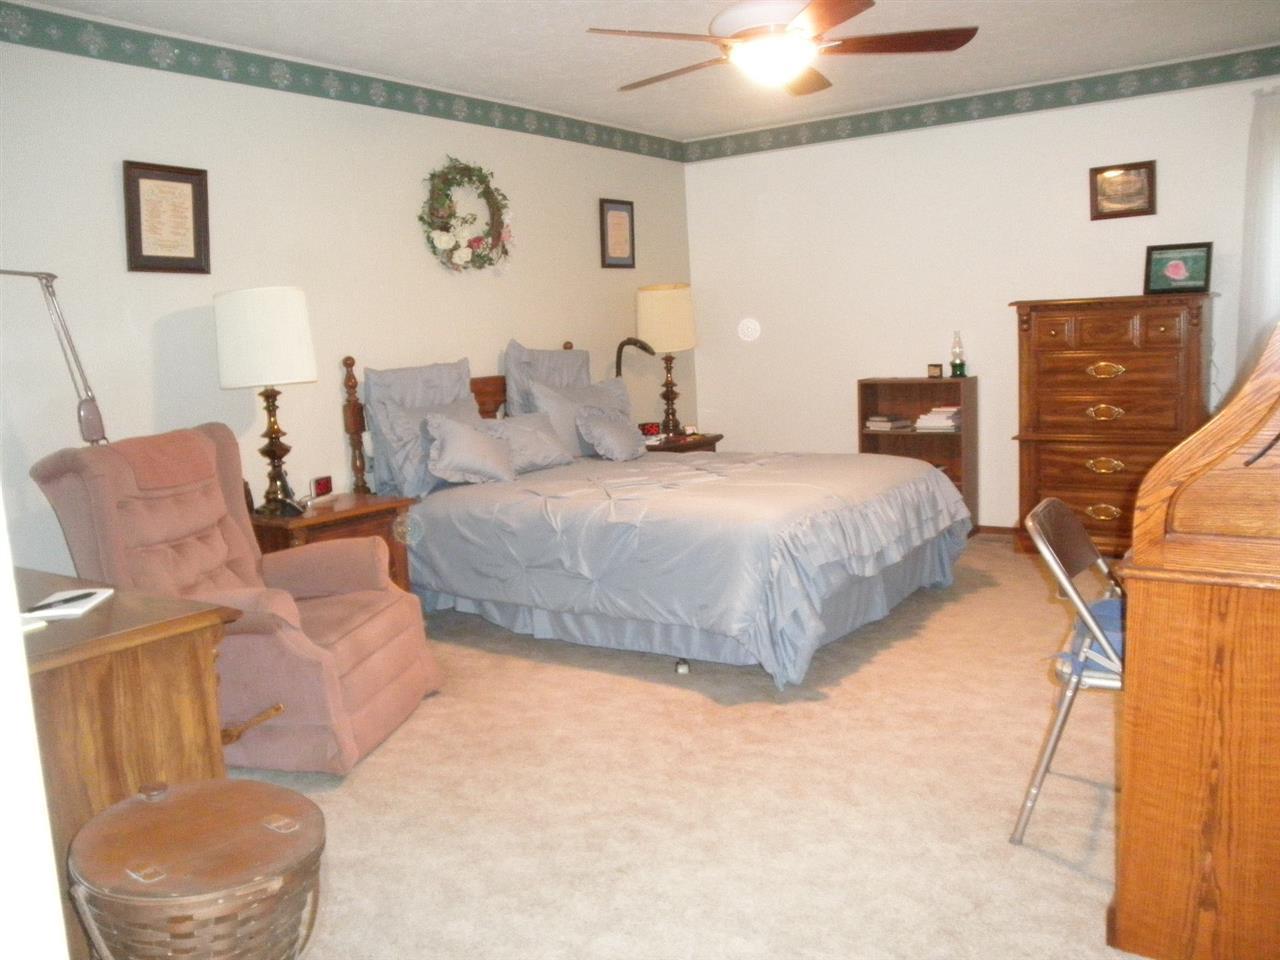 Sold Cross Sale W/ MLS | 1275 S Enterprise Road  Ponca City, OK 74604 12